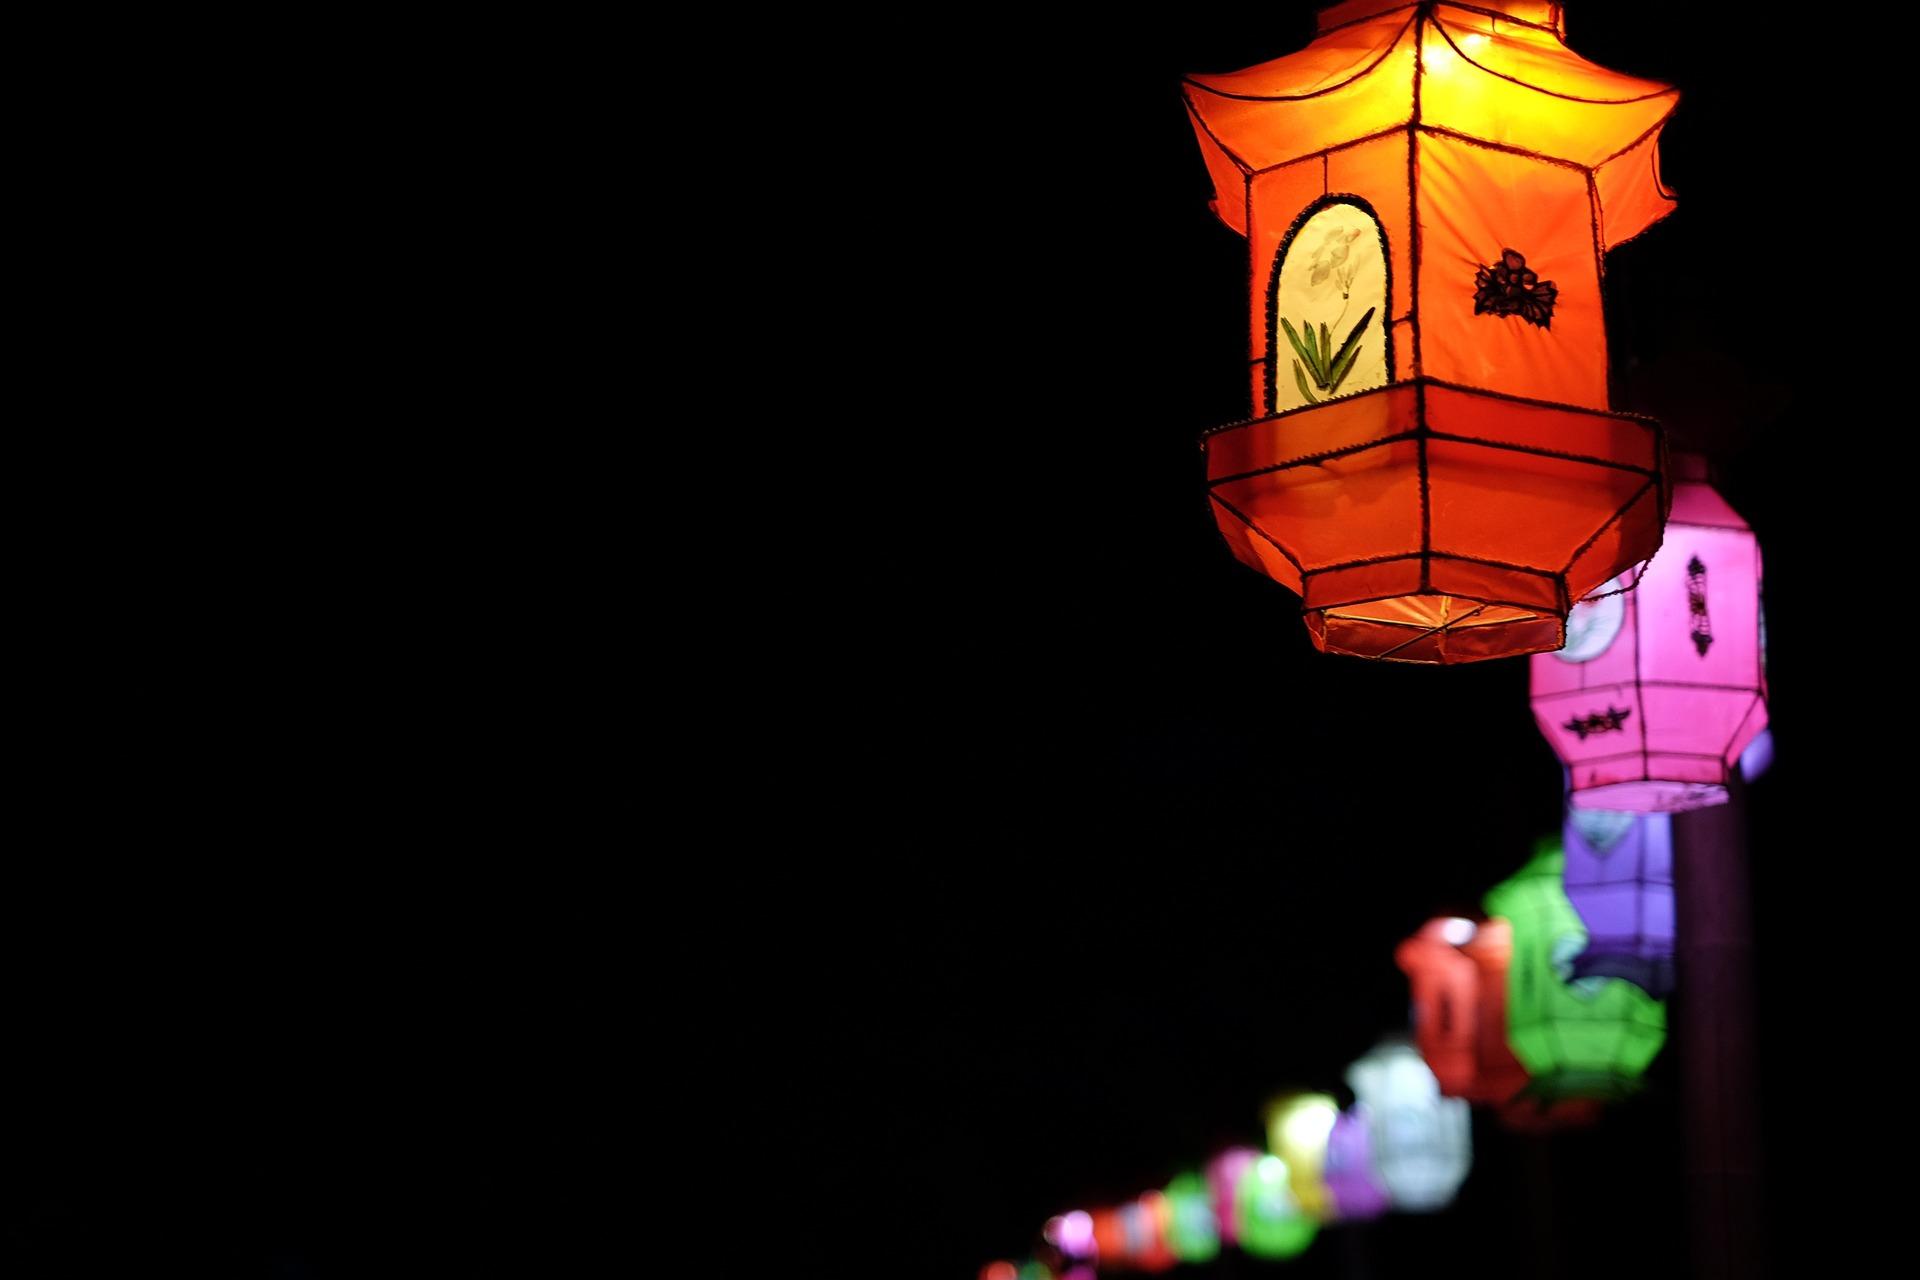 lantern-1209456_1920.jpg